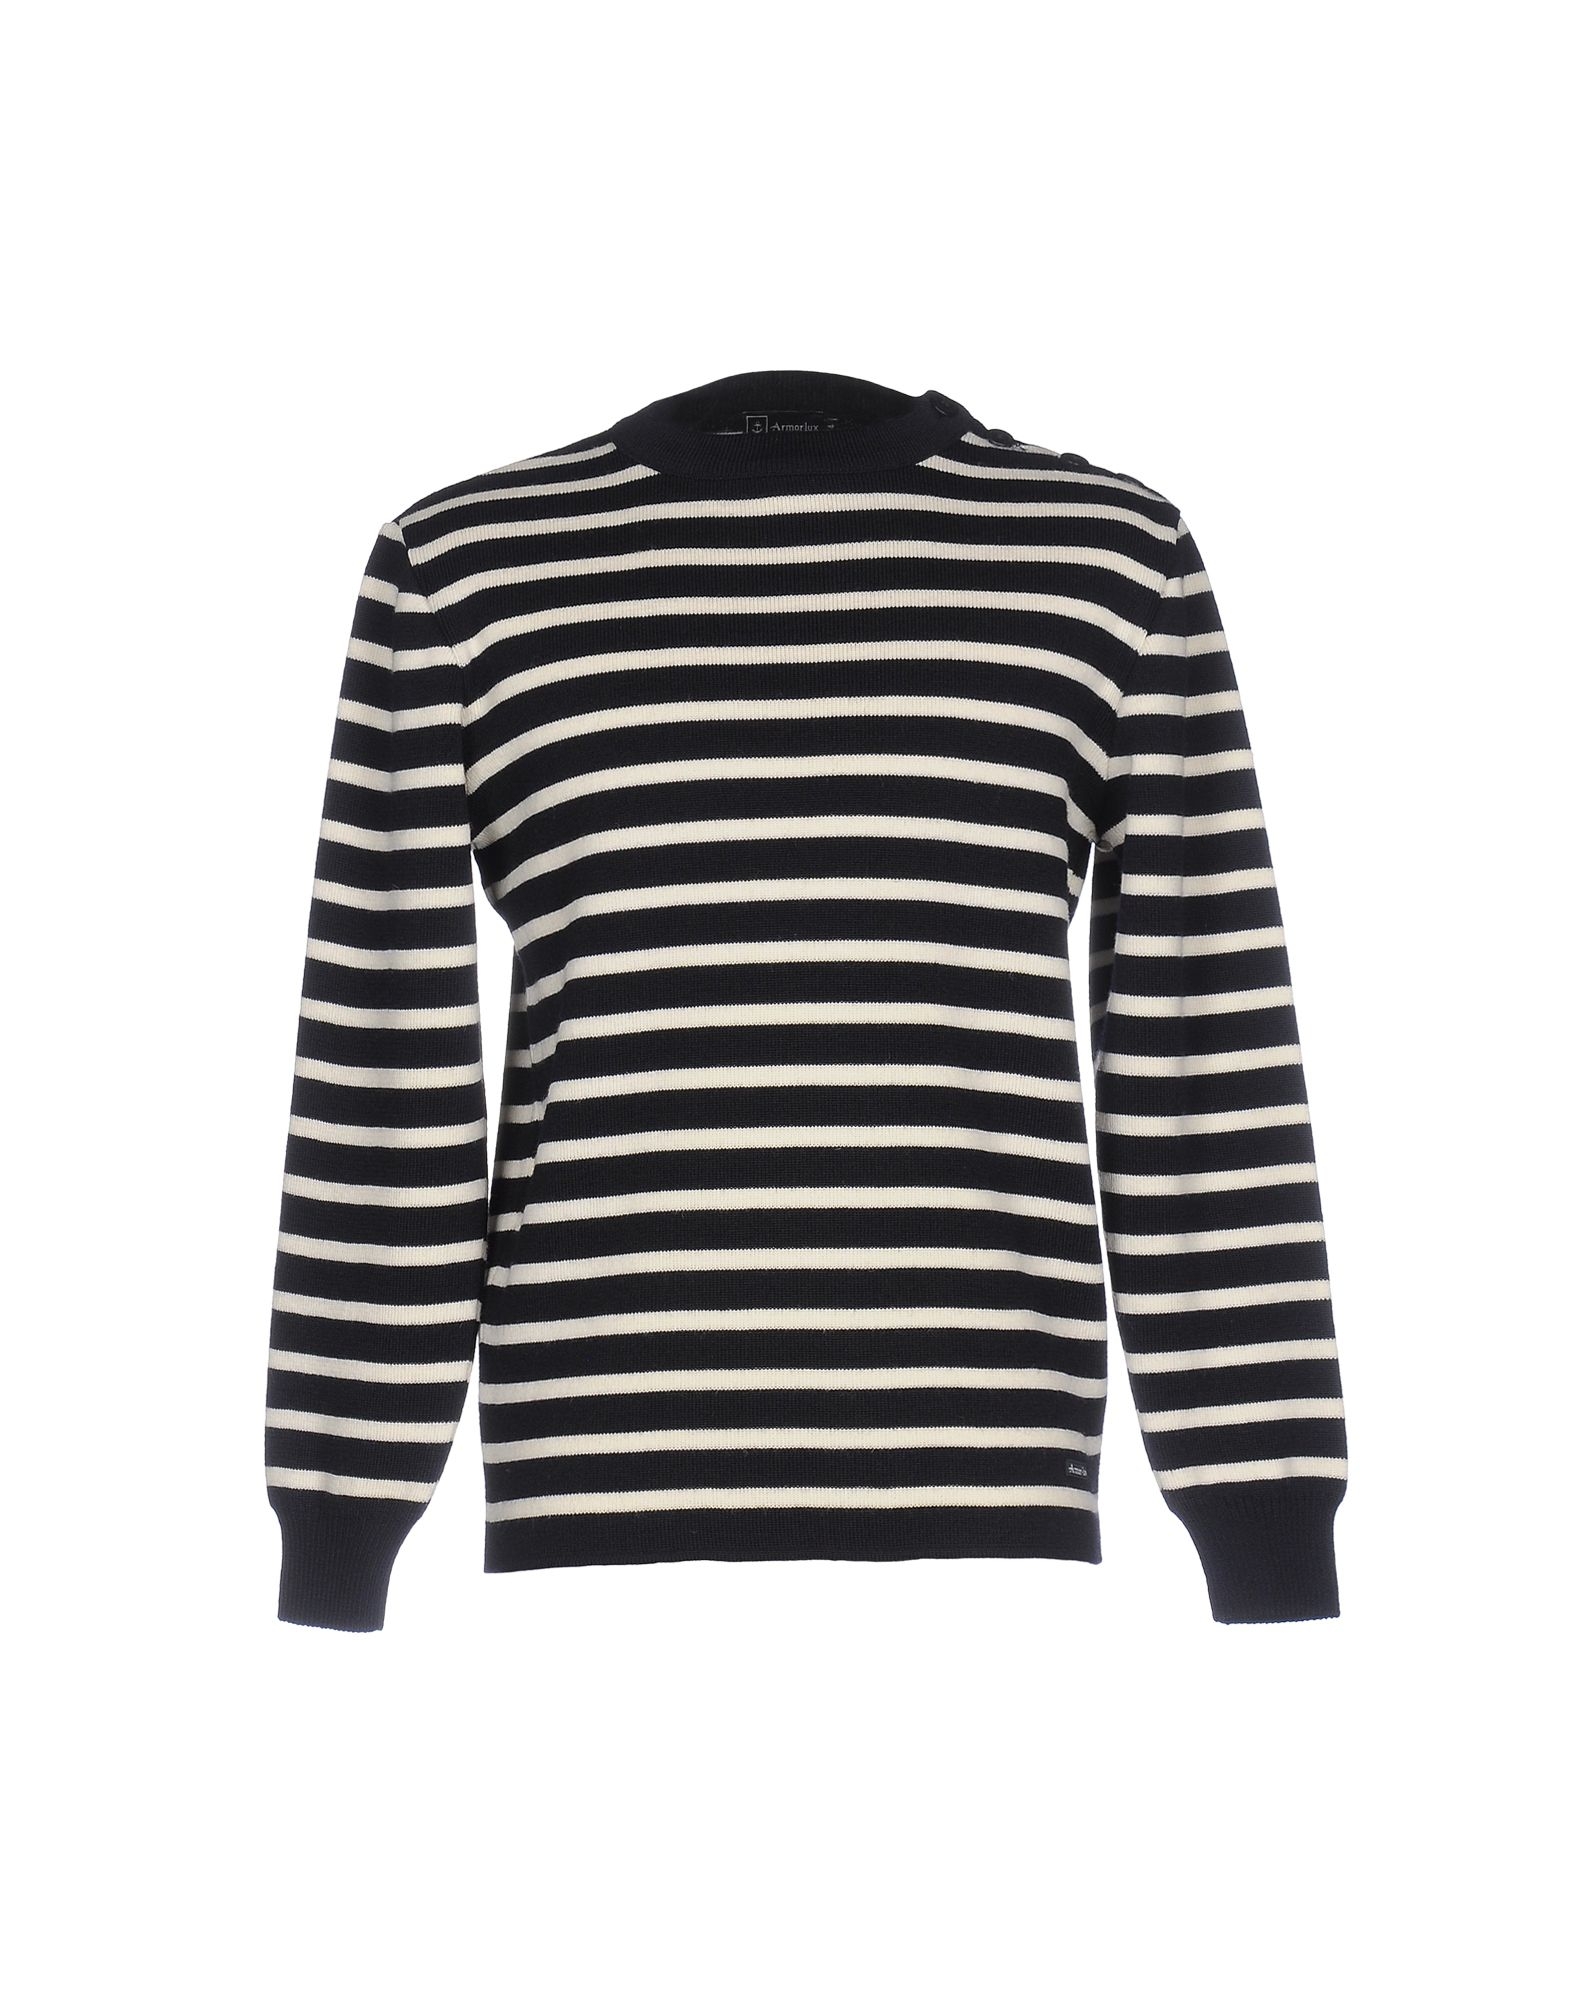 ARMOR-LUX Sweater in Dark Blue